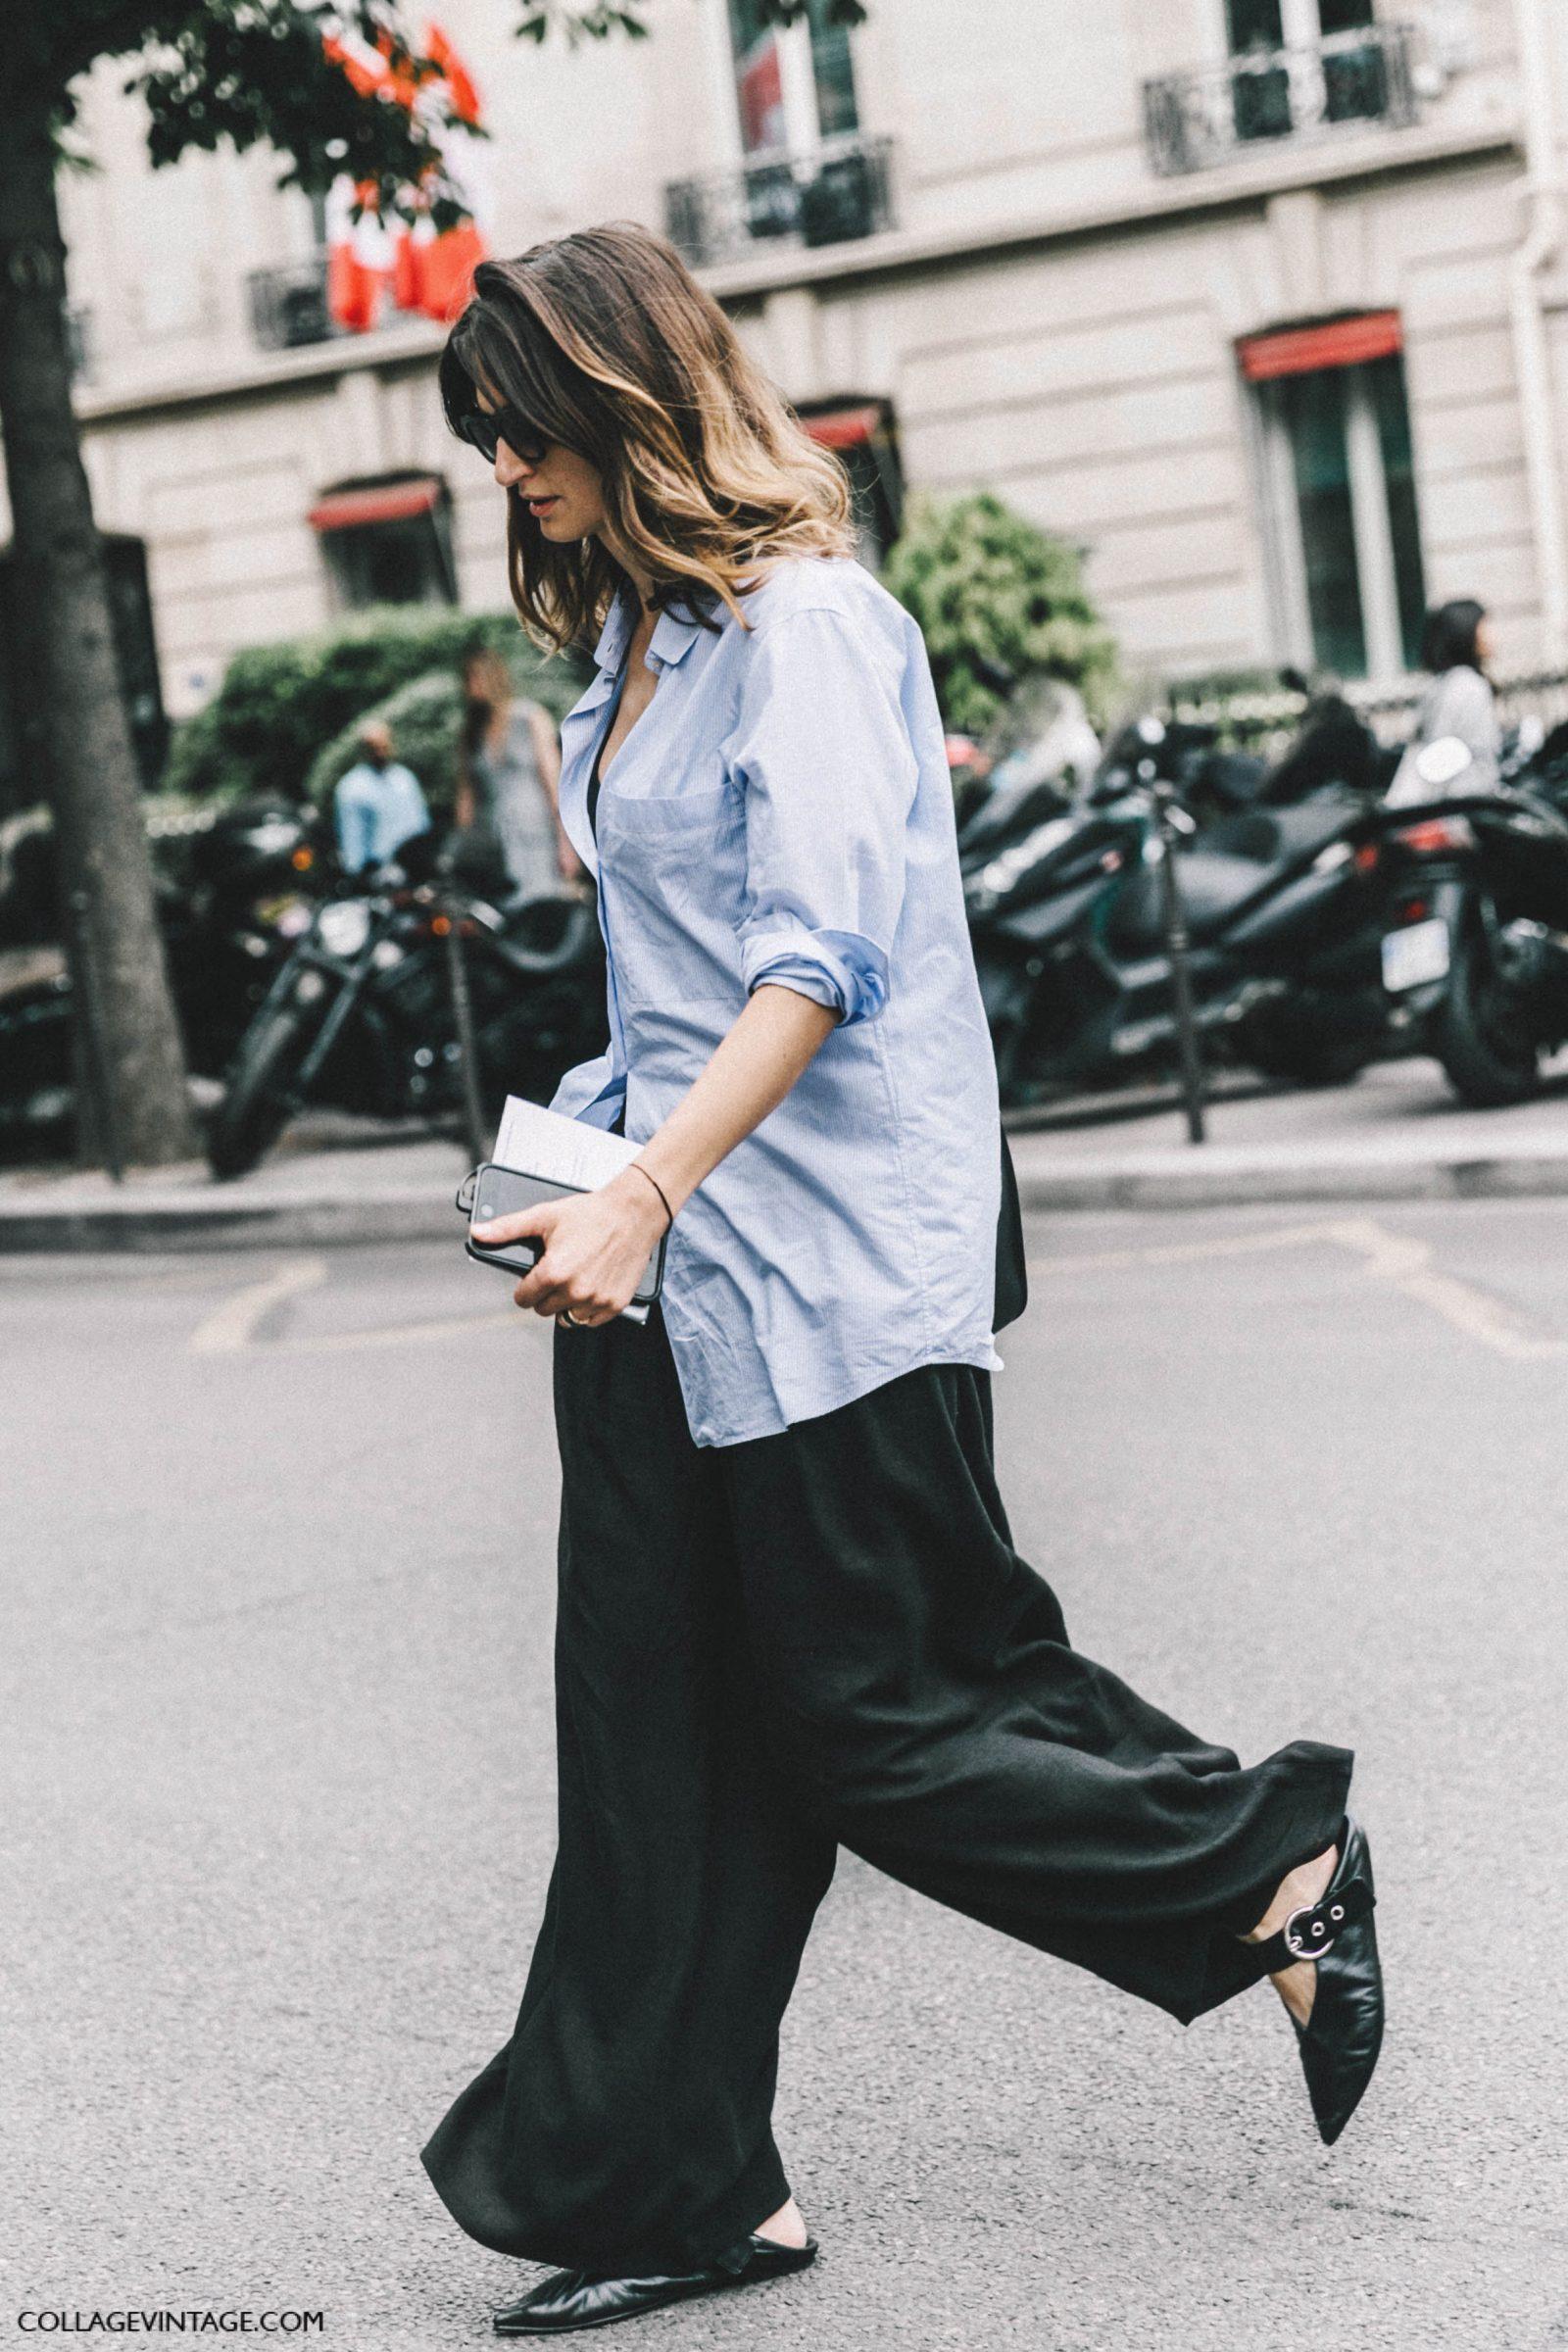 Paris_Couture_Fashion_Week-Collage_Vintage-Street_Style-89